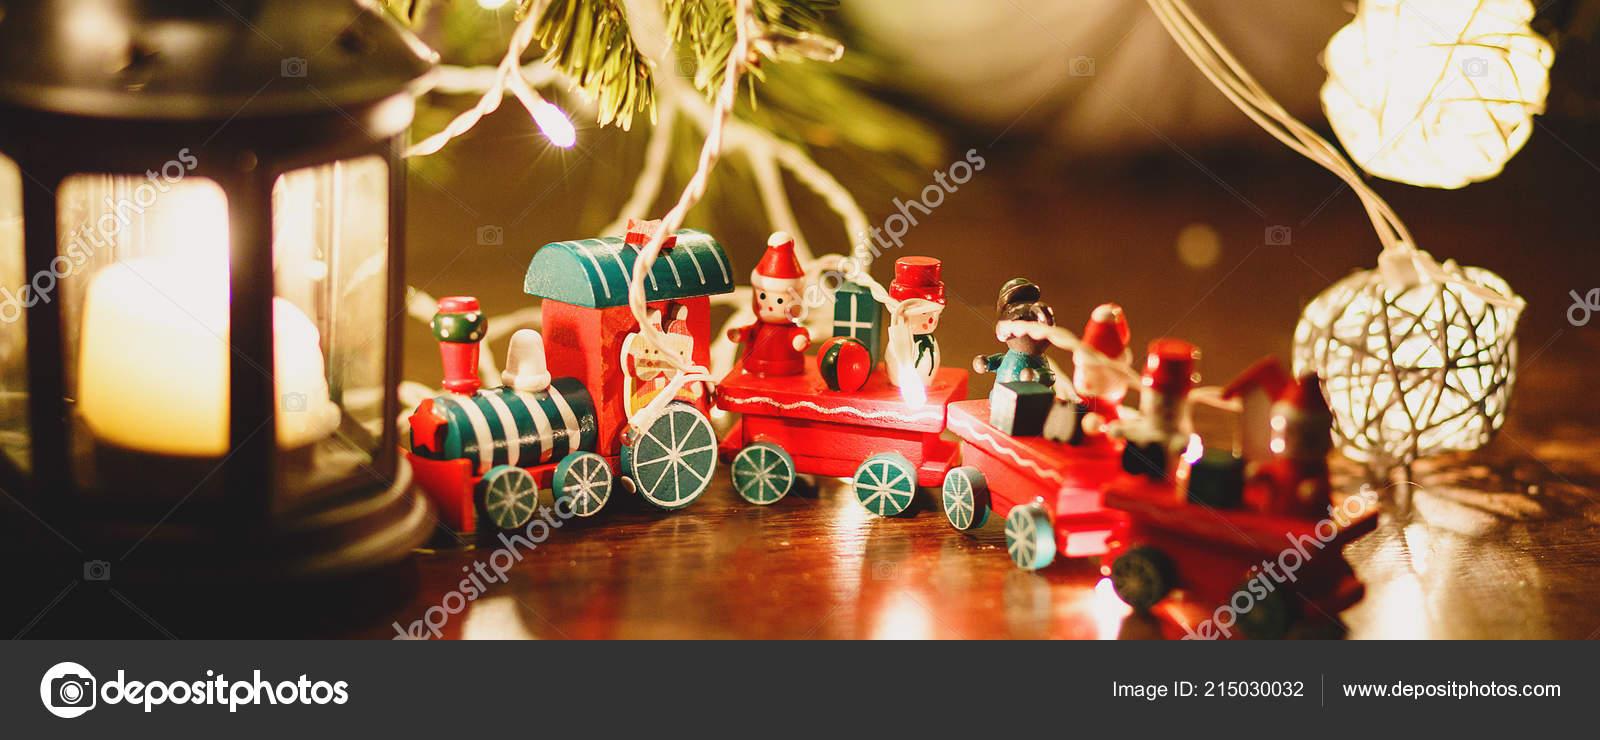 Red Green Train Stands Fir Tree Lights Next Black Candlestick Stock Photo C Chekyravaa 215030032